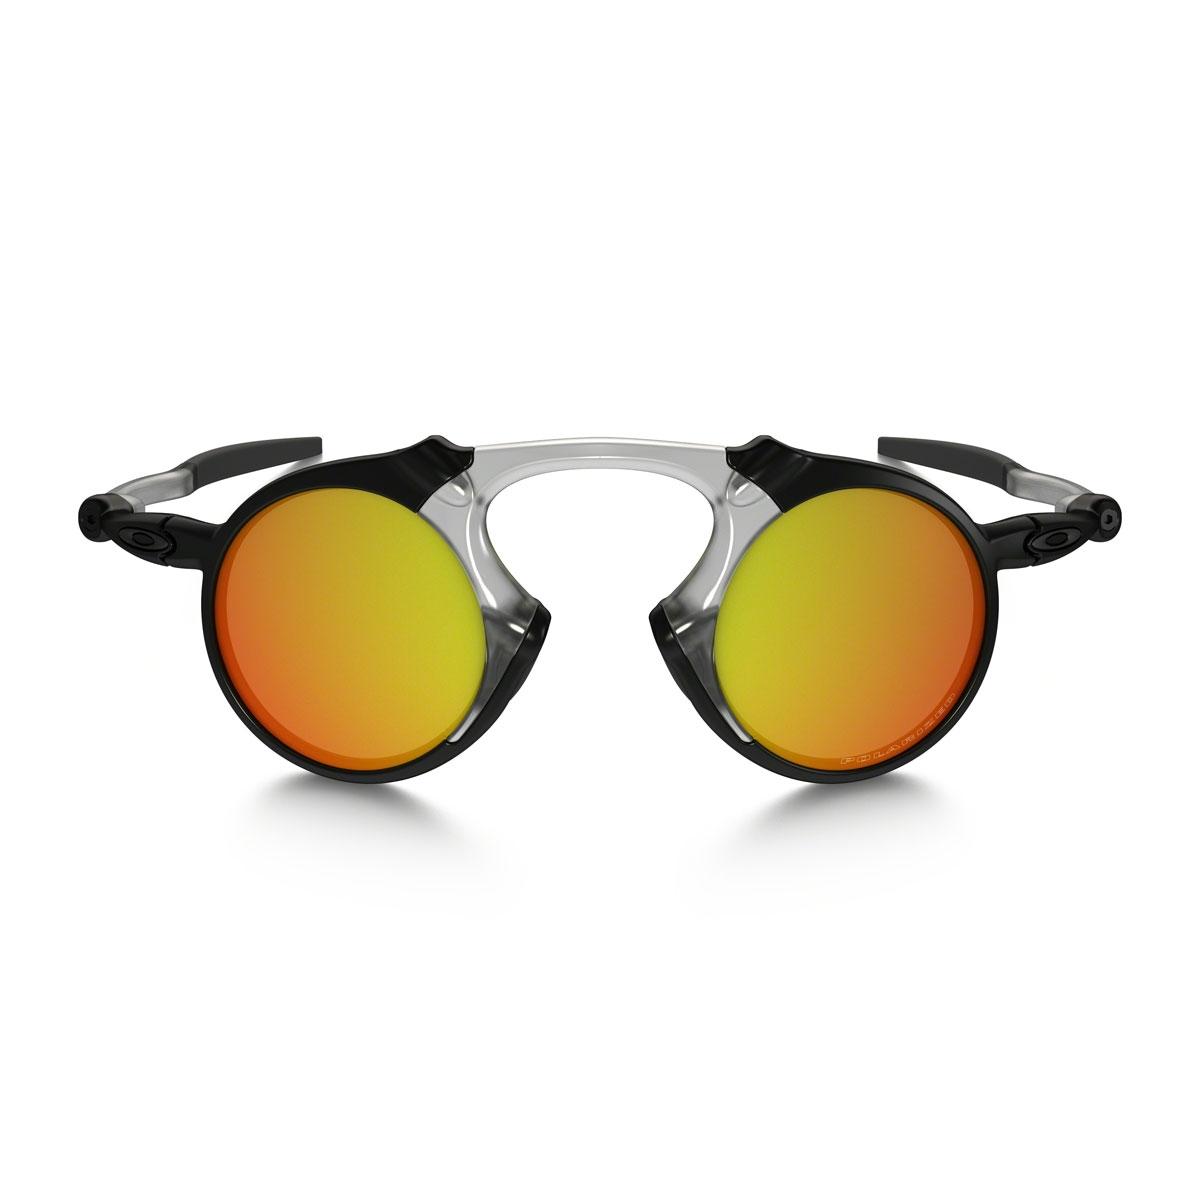 e5d26fb9538 ... denmark image of oakley madman polarized sunglasses dark carbon frame  ruby iridium polarized lens e83a7 e0bd6